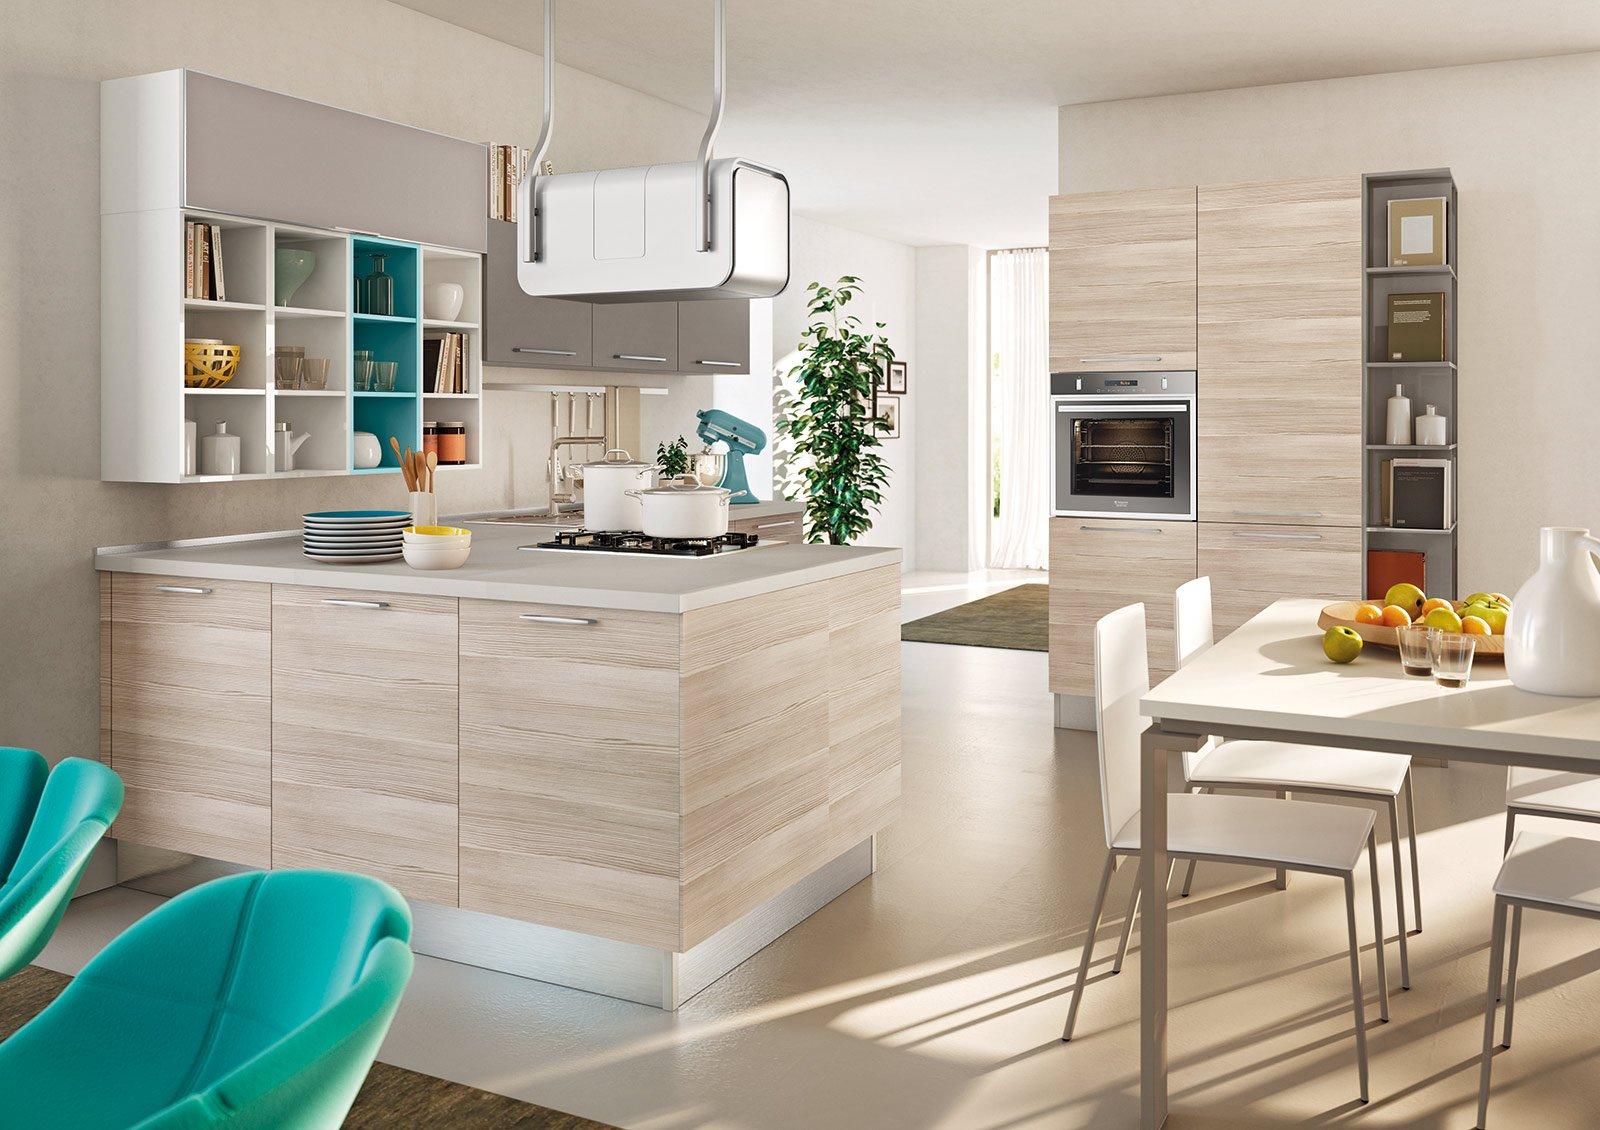 Cucine modelli dall 39 anima green cose di casa - Immagini di cucina ...